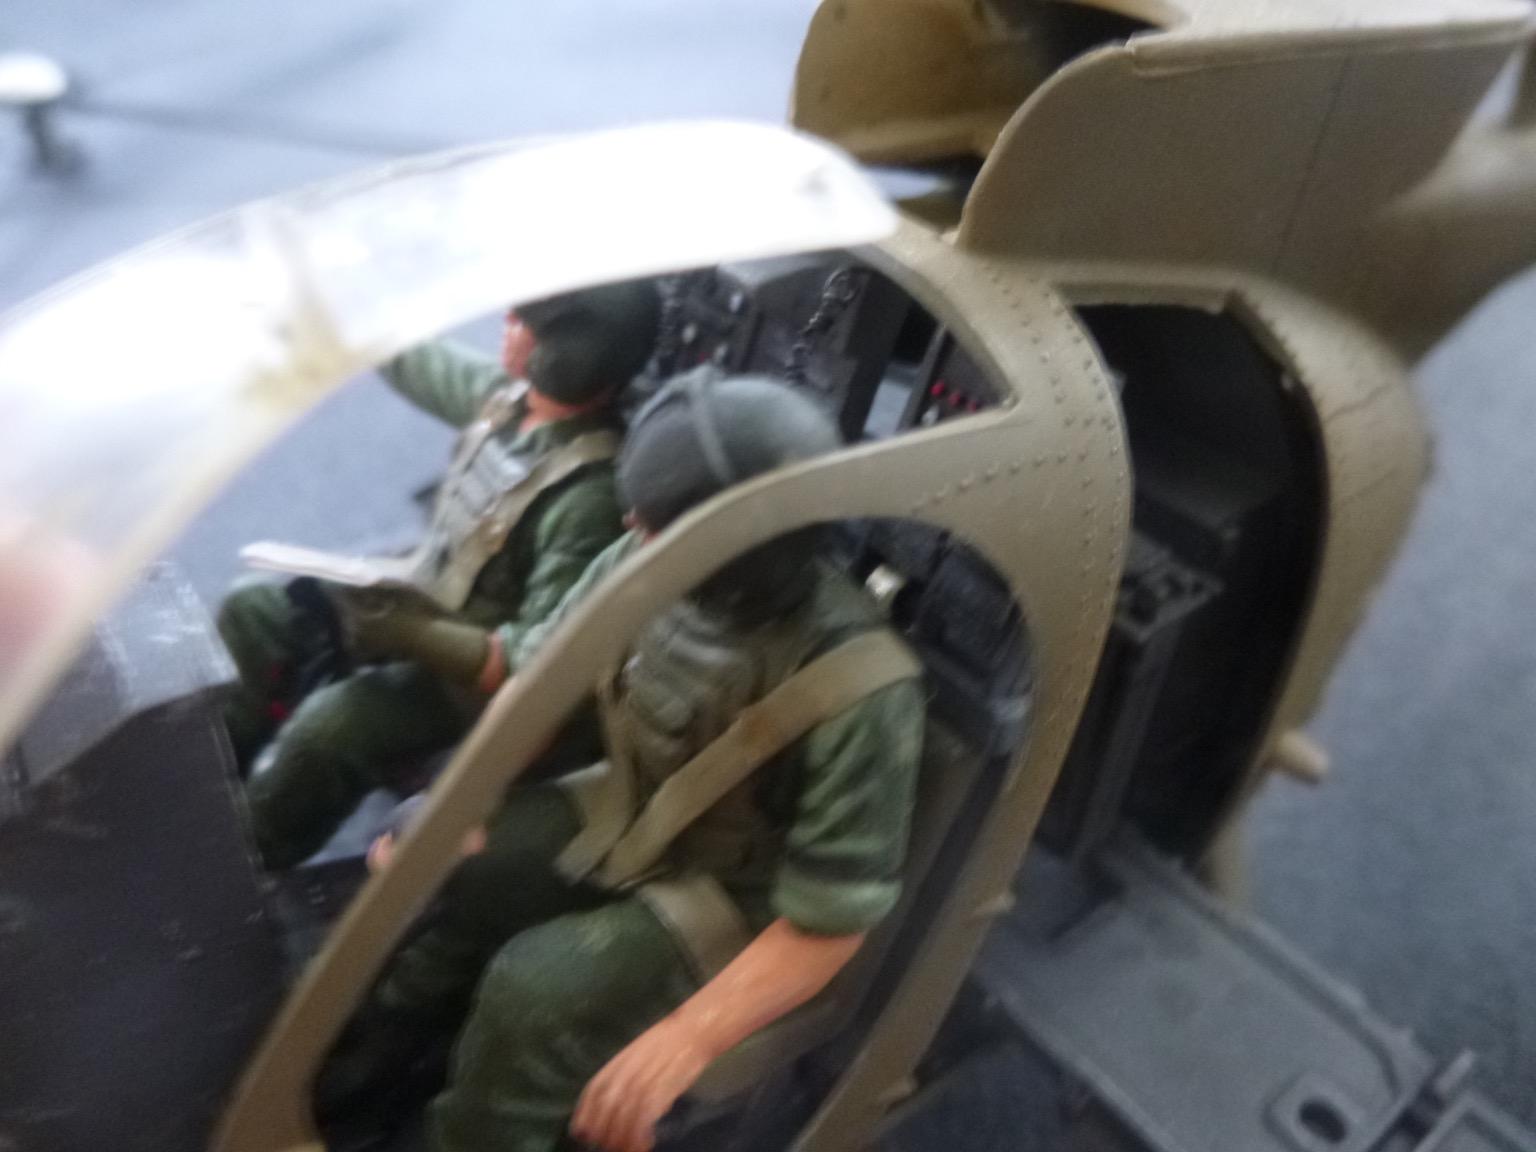 Hélicoptère AH6 little bird + équipage  Dragon 1/35 - Page 2 170709102202286403